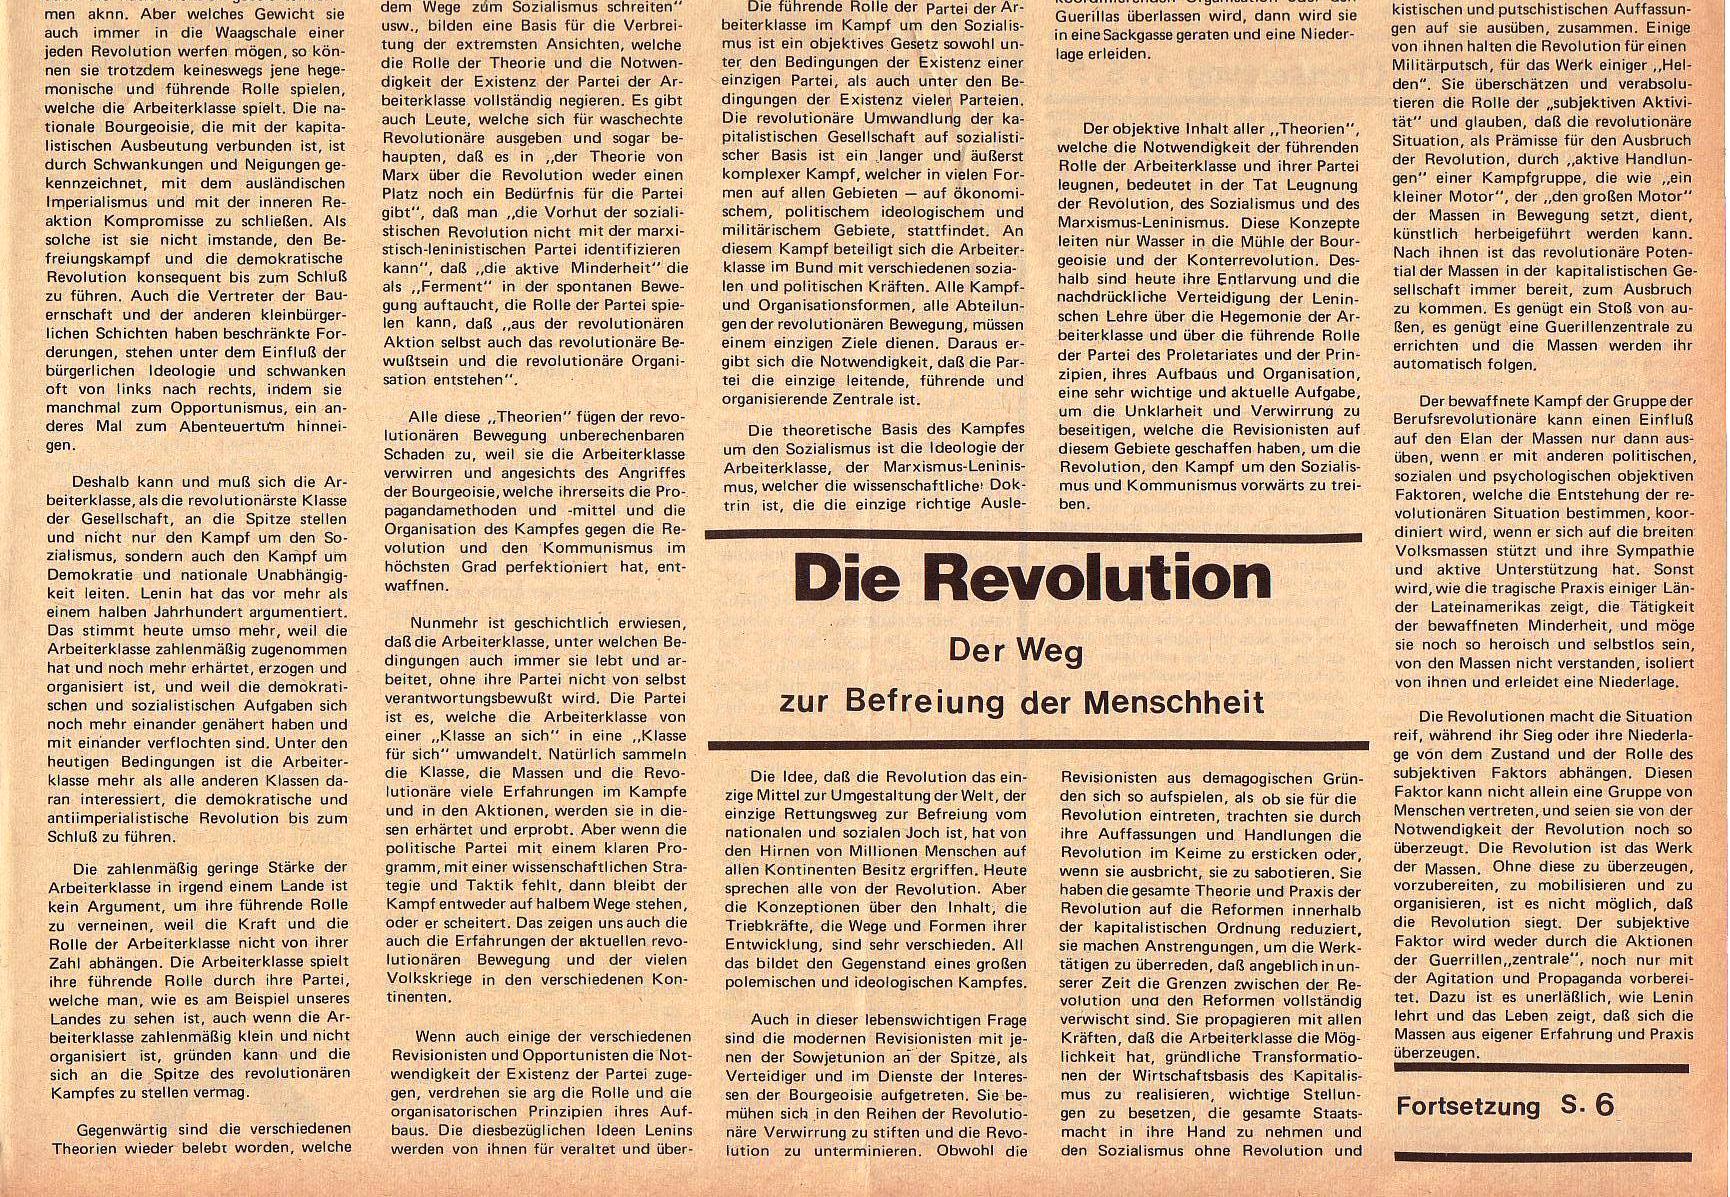 Roter Morgen, 5. Jg., 6. Dezember 1971, Nr. 15, Seite 5b